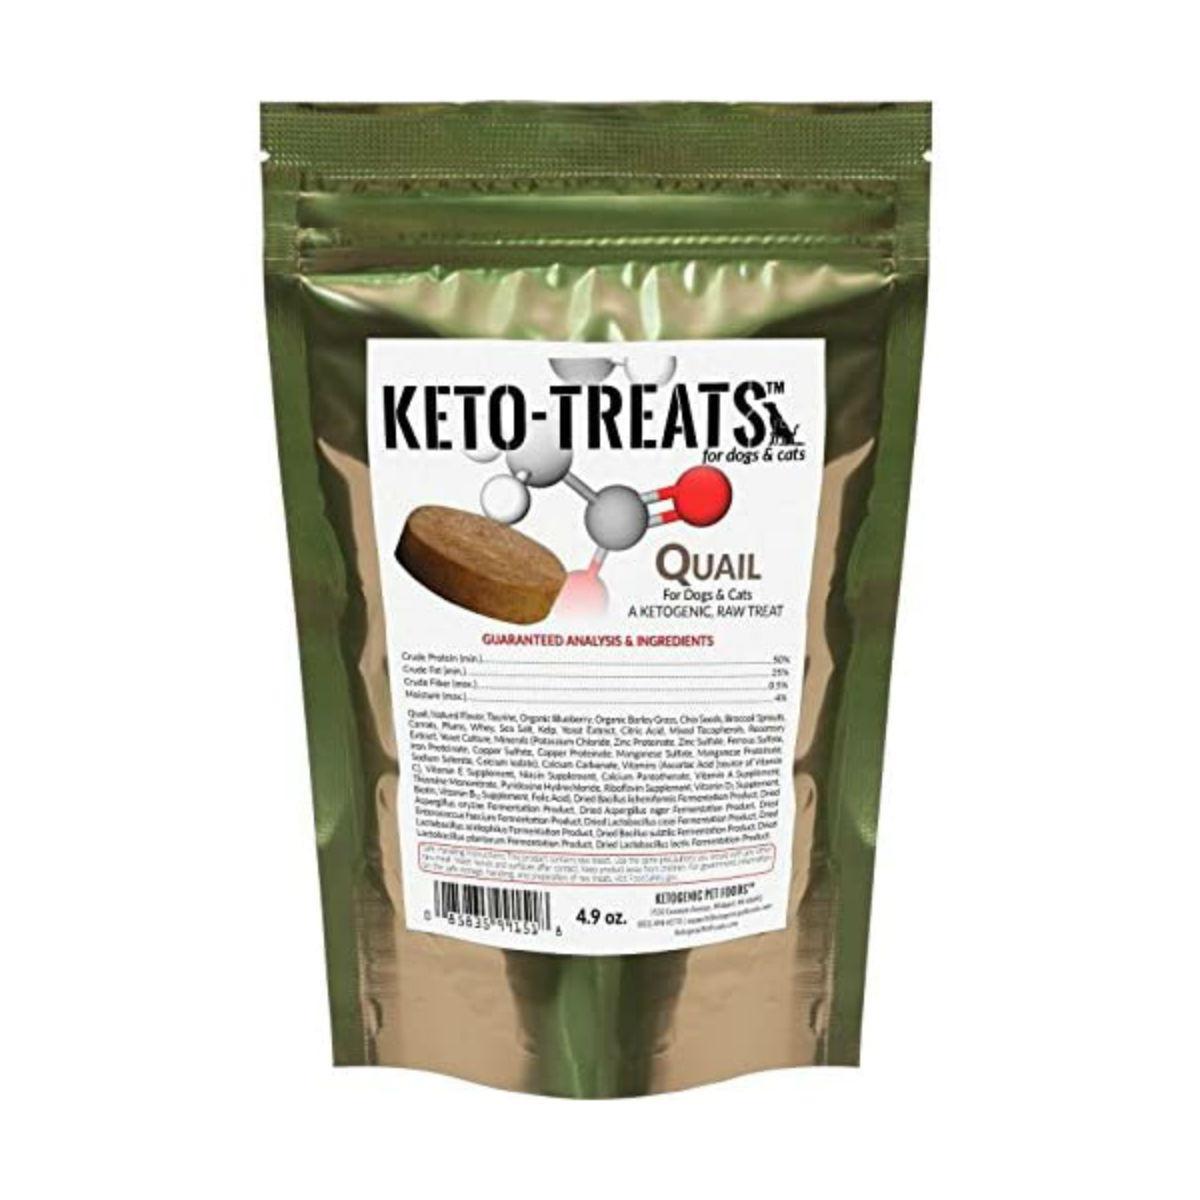 Ketogenic Pet Foods Keto-Treats™ Cat & Dog Treats - Quail